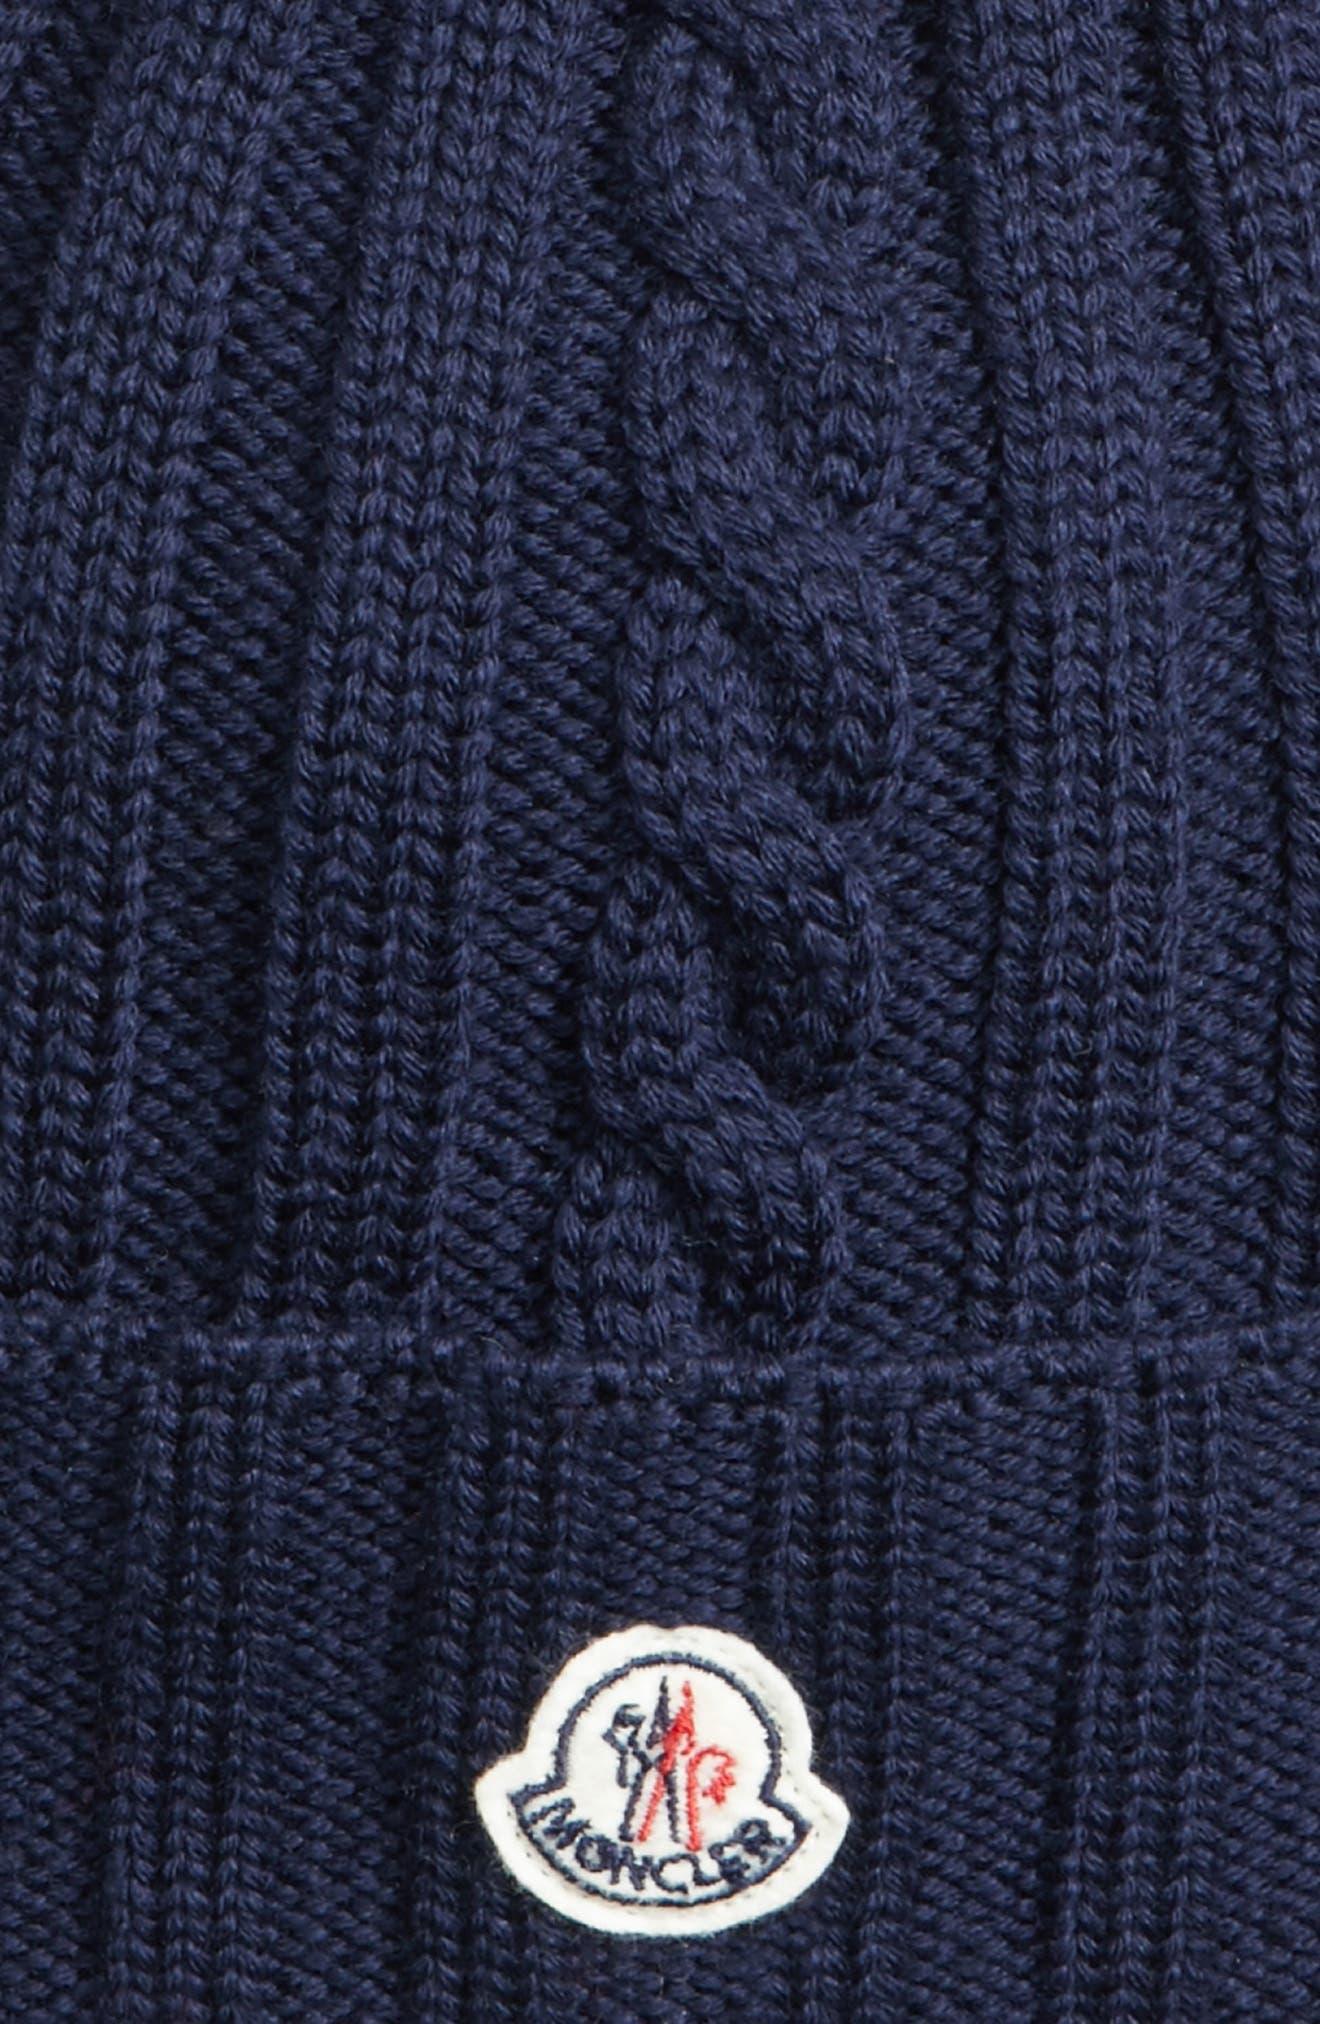 f3cea3c6cd8 Moncler Hats for Women